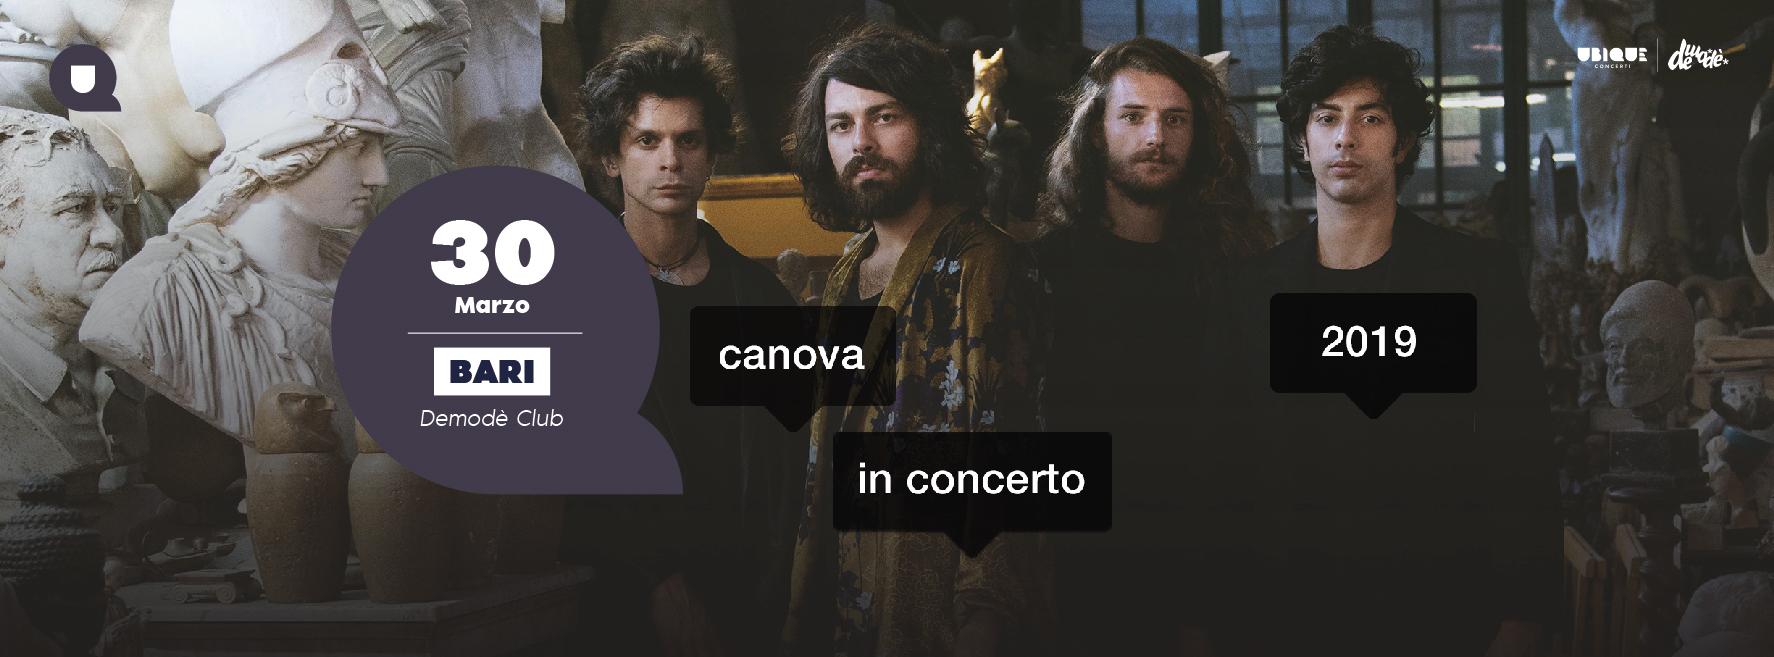 Canova online cover